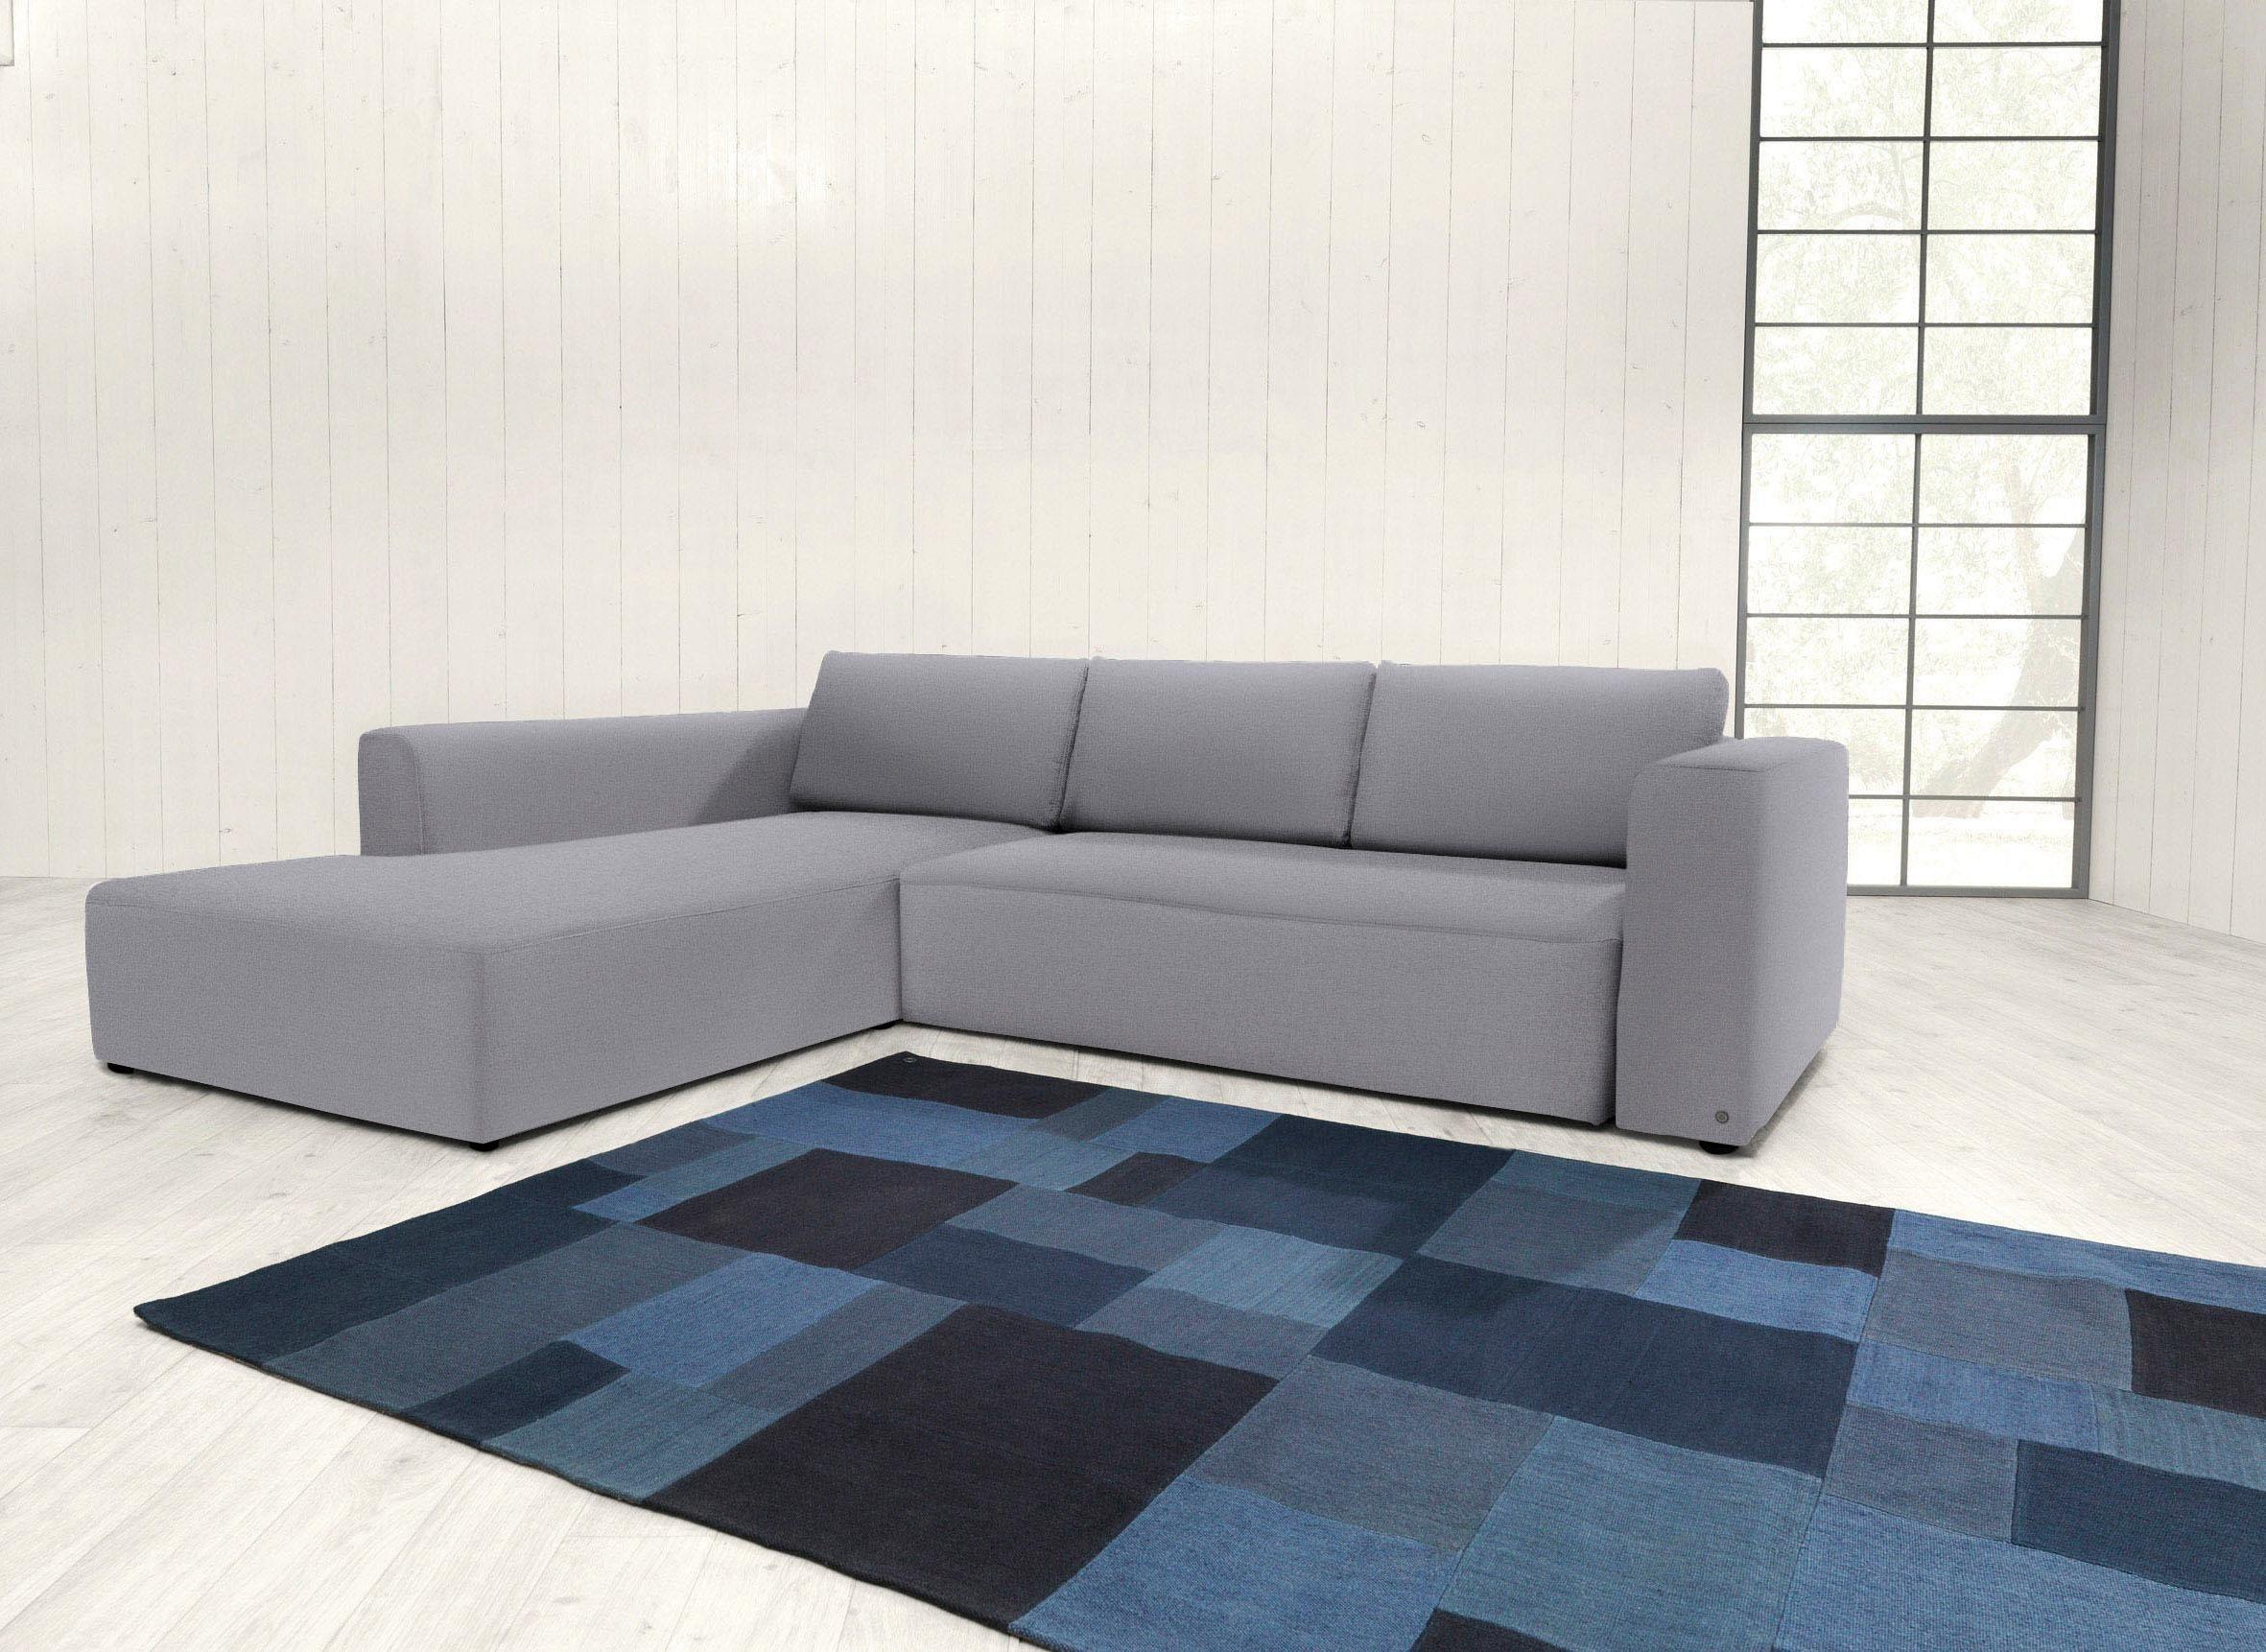 tom tailor ecksofa simple sofa tom tailor beautiful tom tailor couch tom tailor ecksofa nordic. Black Bedroom Furniture Sets. Home Design Ideas